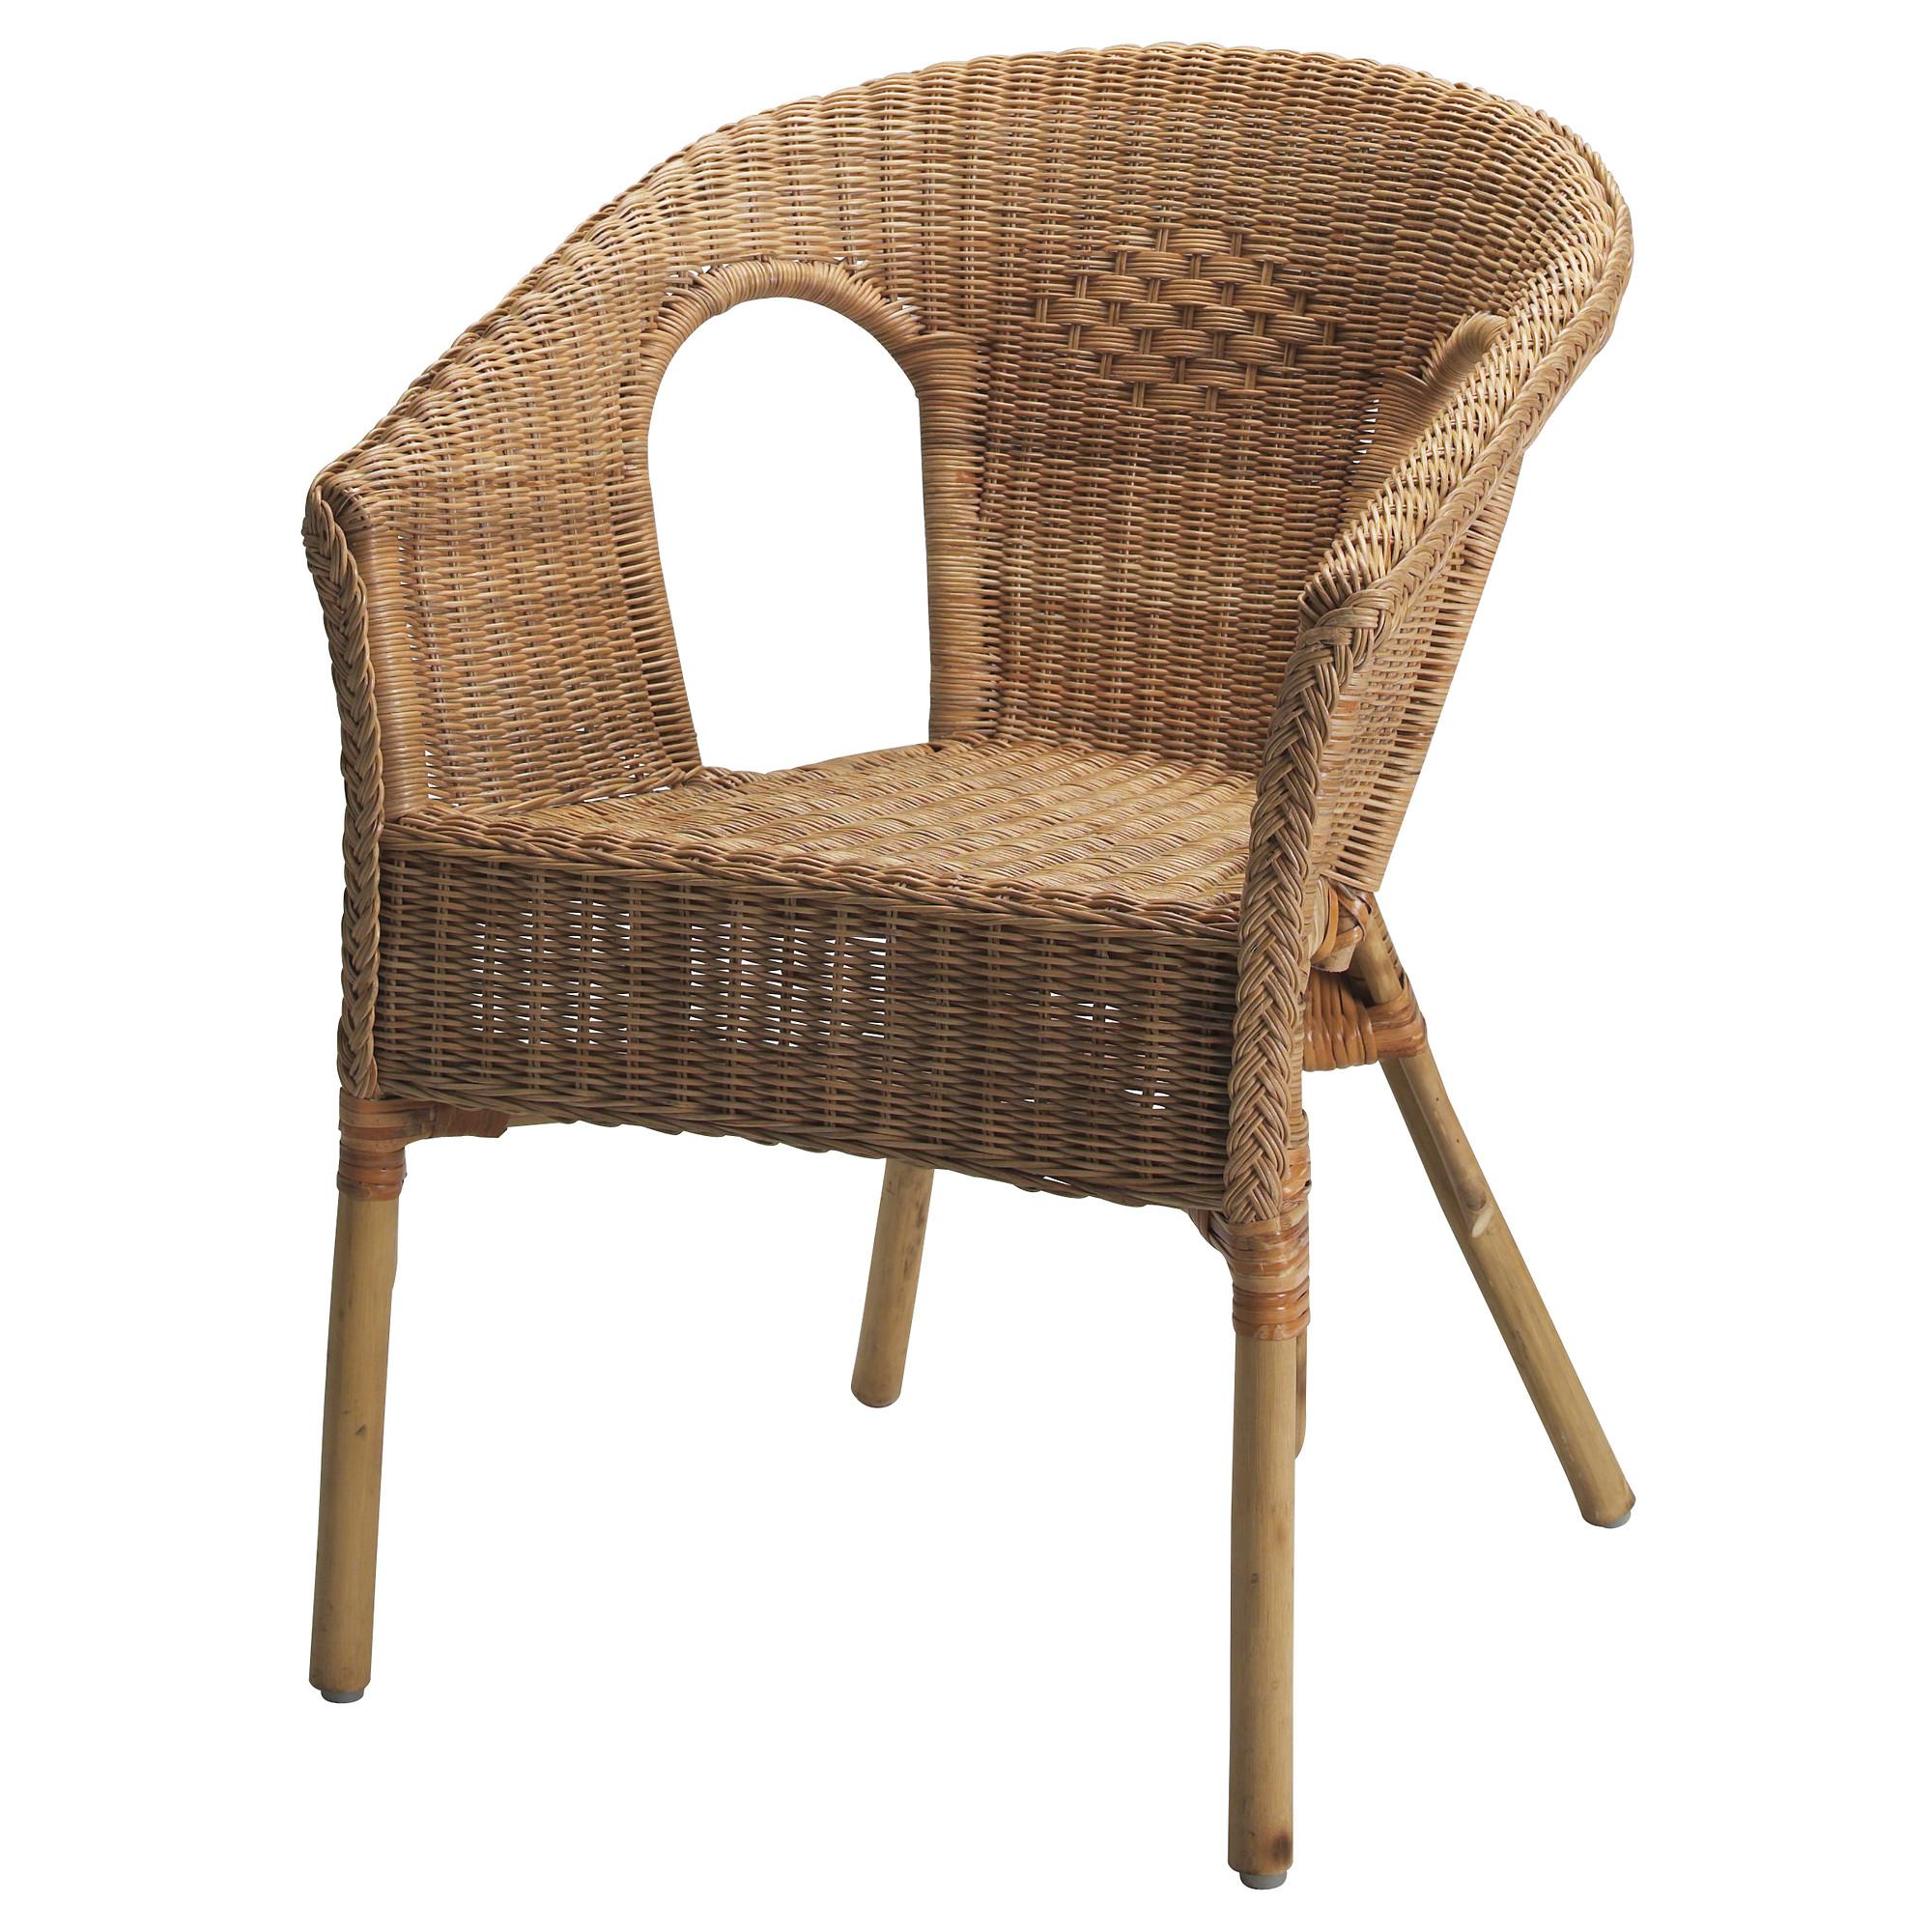 rattan chairs ikea LCDAVBI